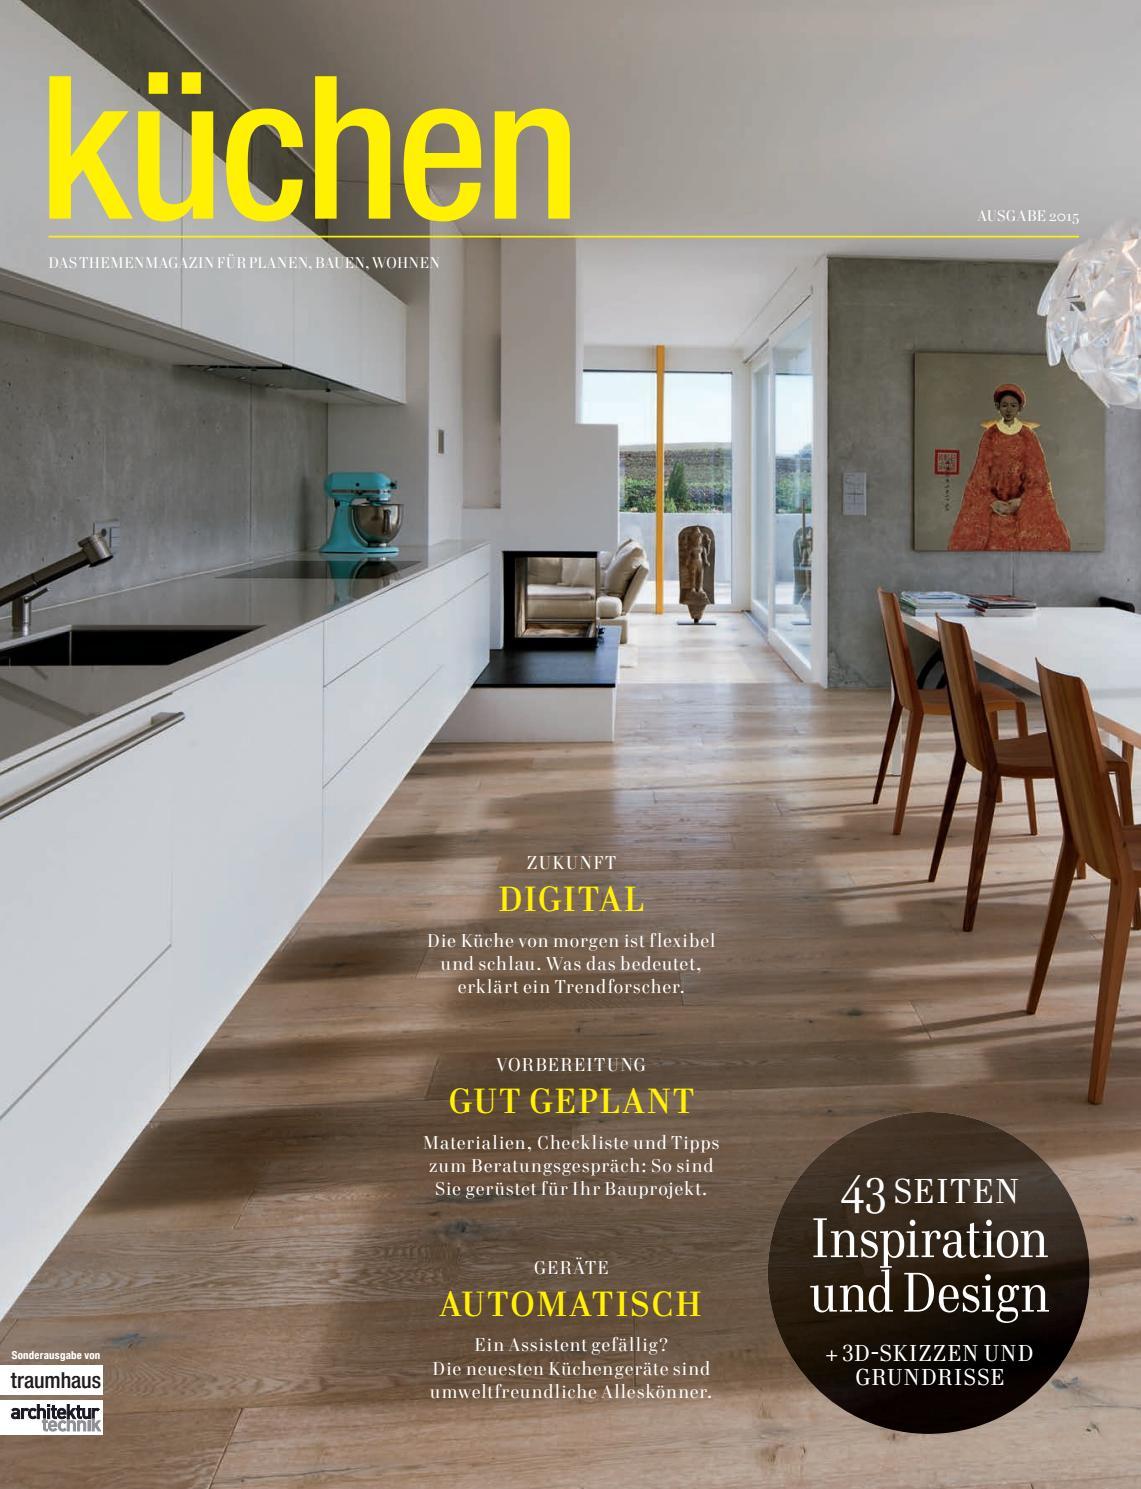 kuechenspezialisten.de 2014 by Fachschriften Verlag - issuu